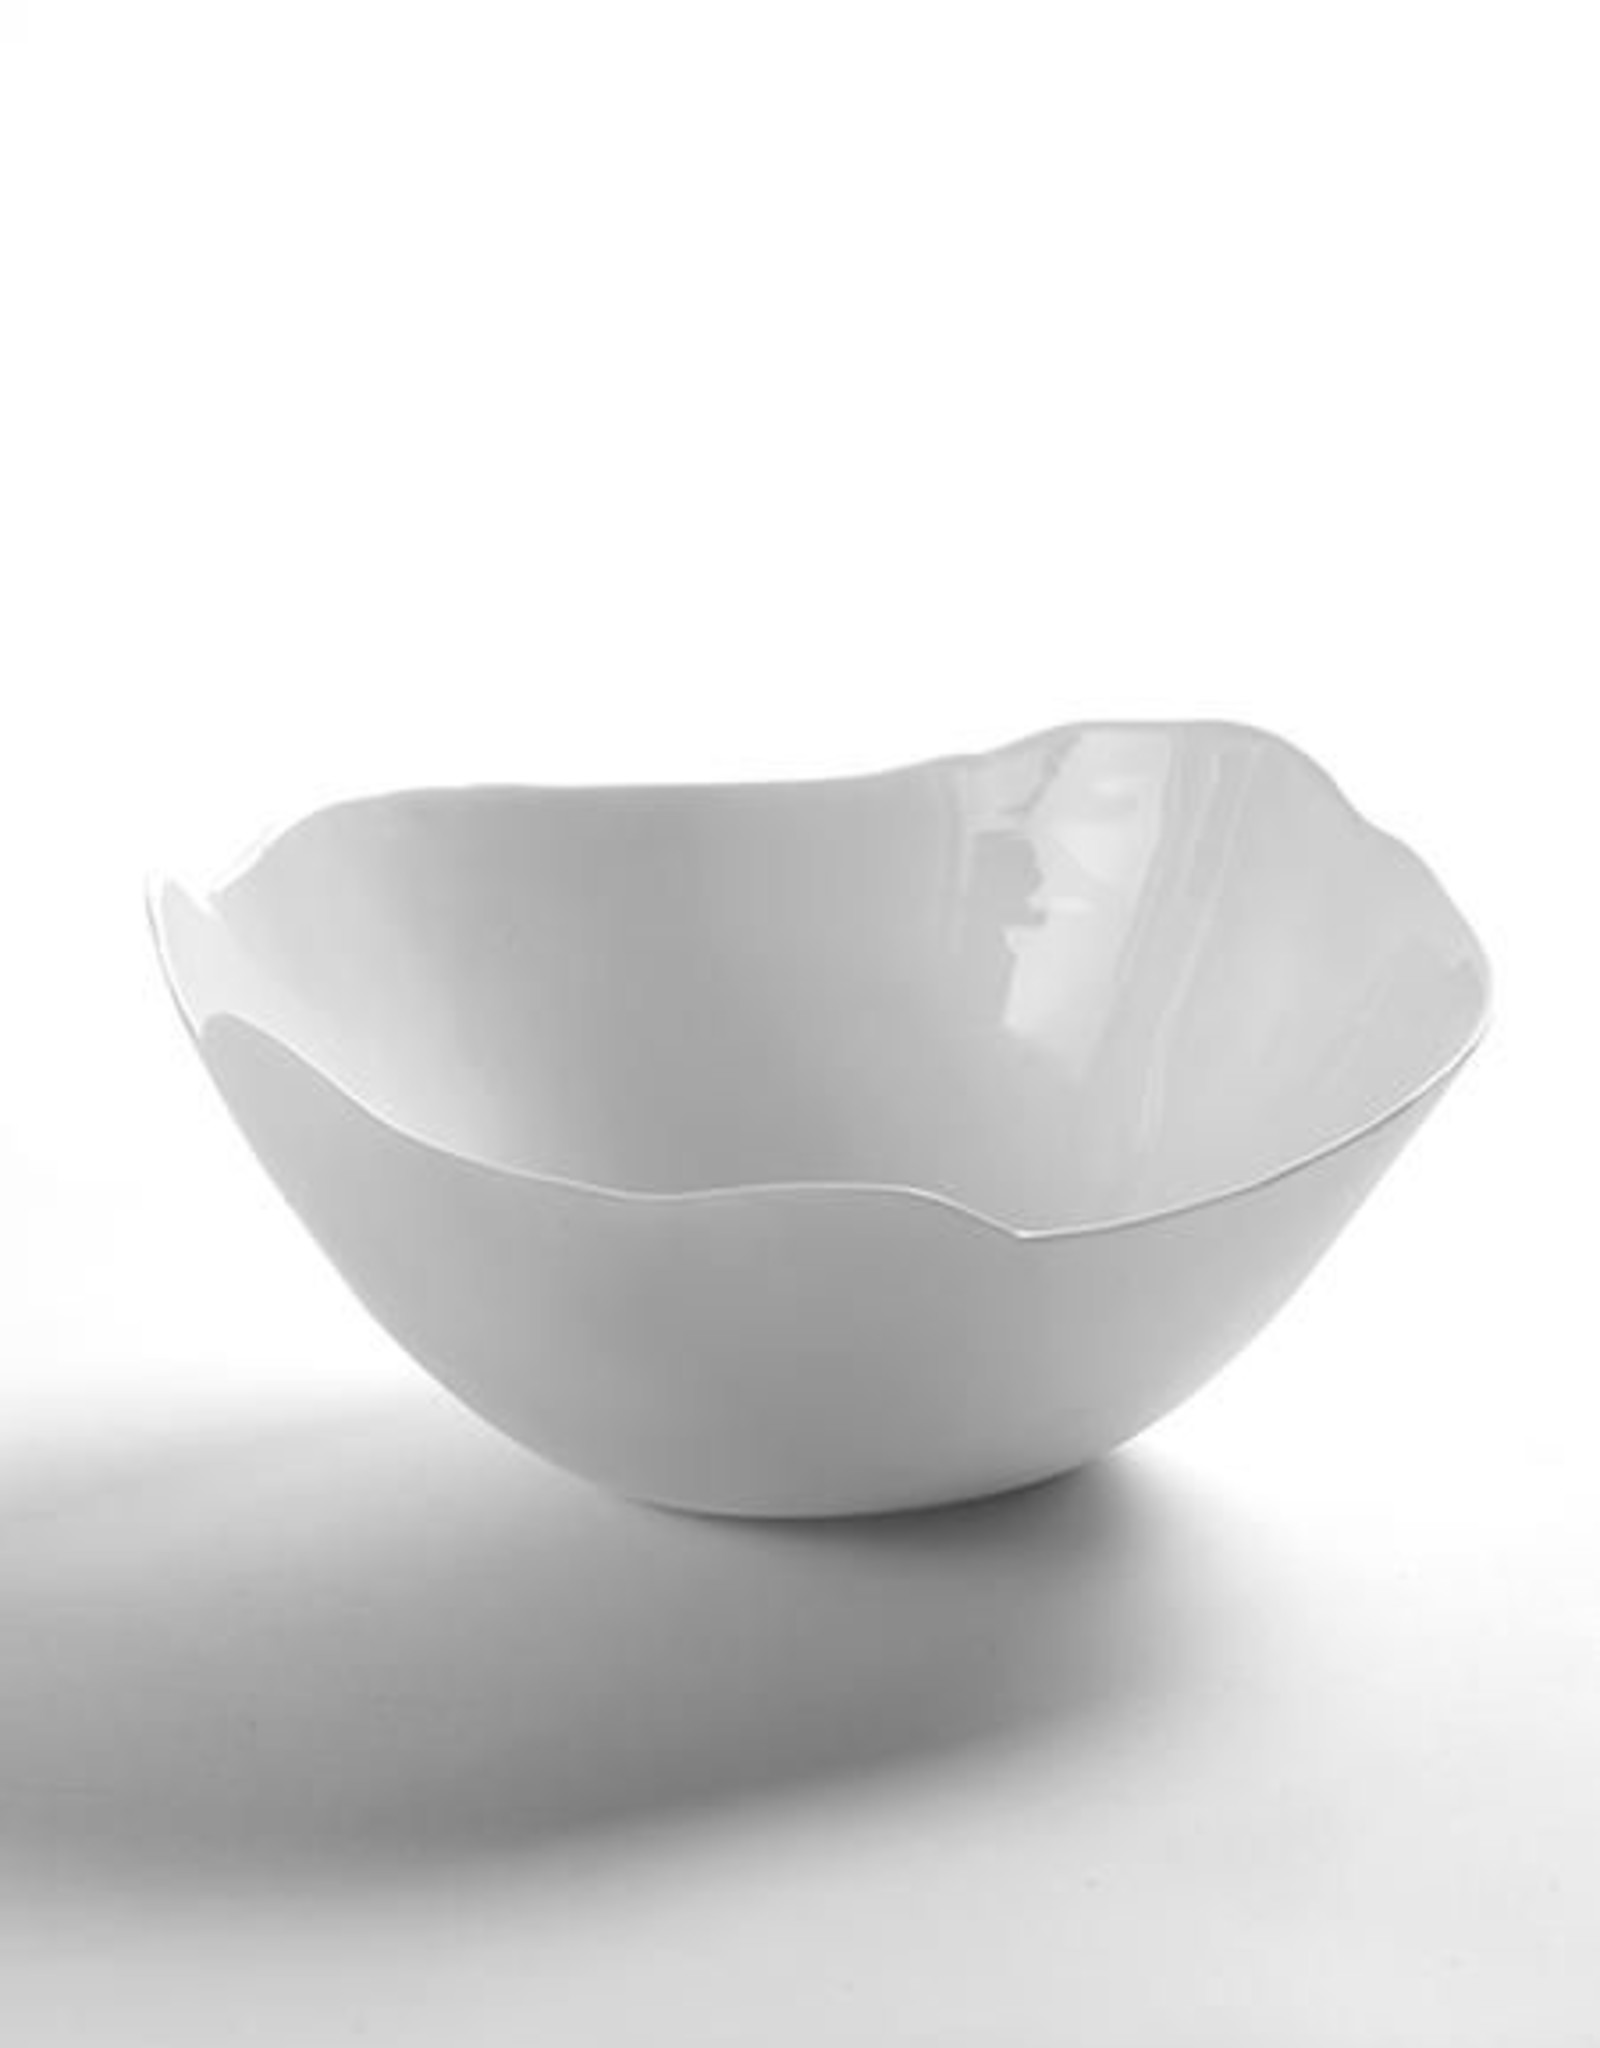 BIDK Home 'Shanti' Salad Bowl